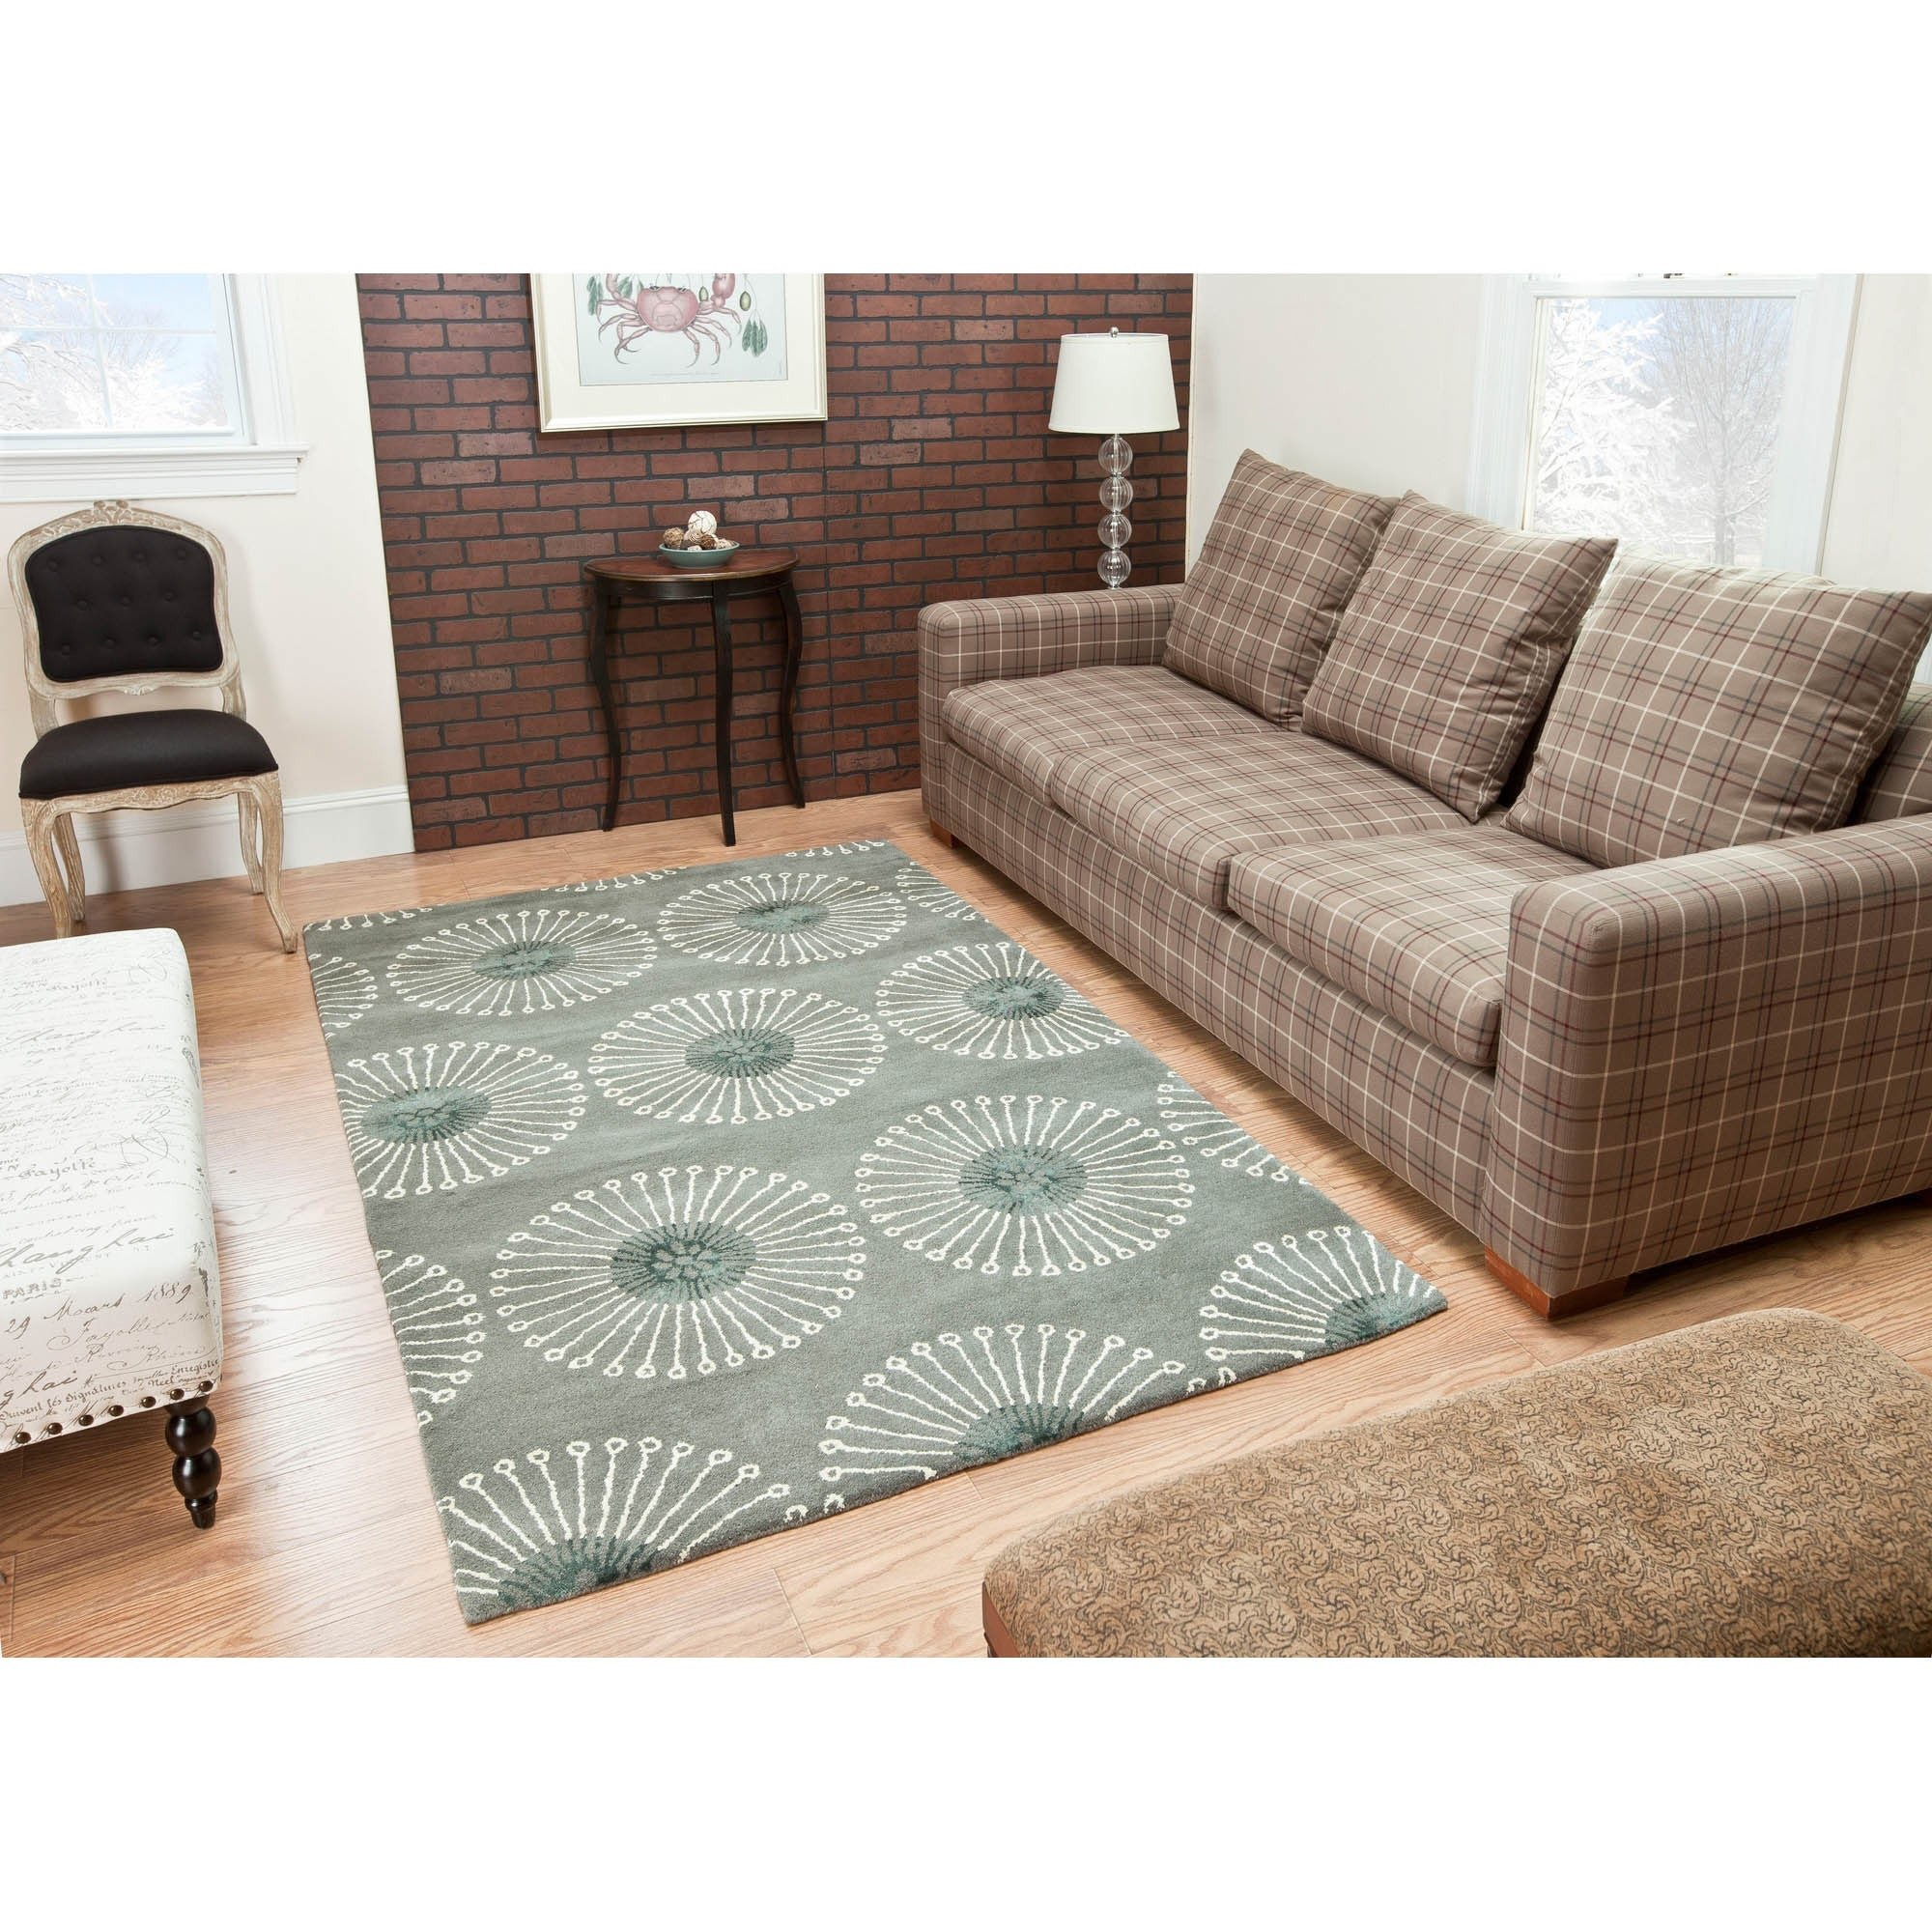 "Accent Rugs for Bedroom Beautiful Safavieh Handmade soho Zen Grey Ivory New Zealand Wool Rug 9 6"" X 13 6"""